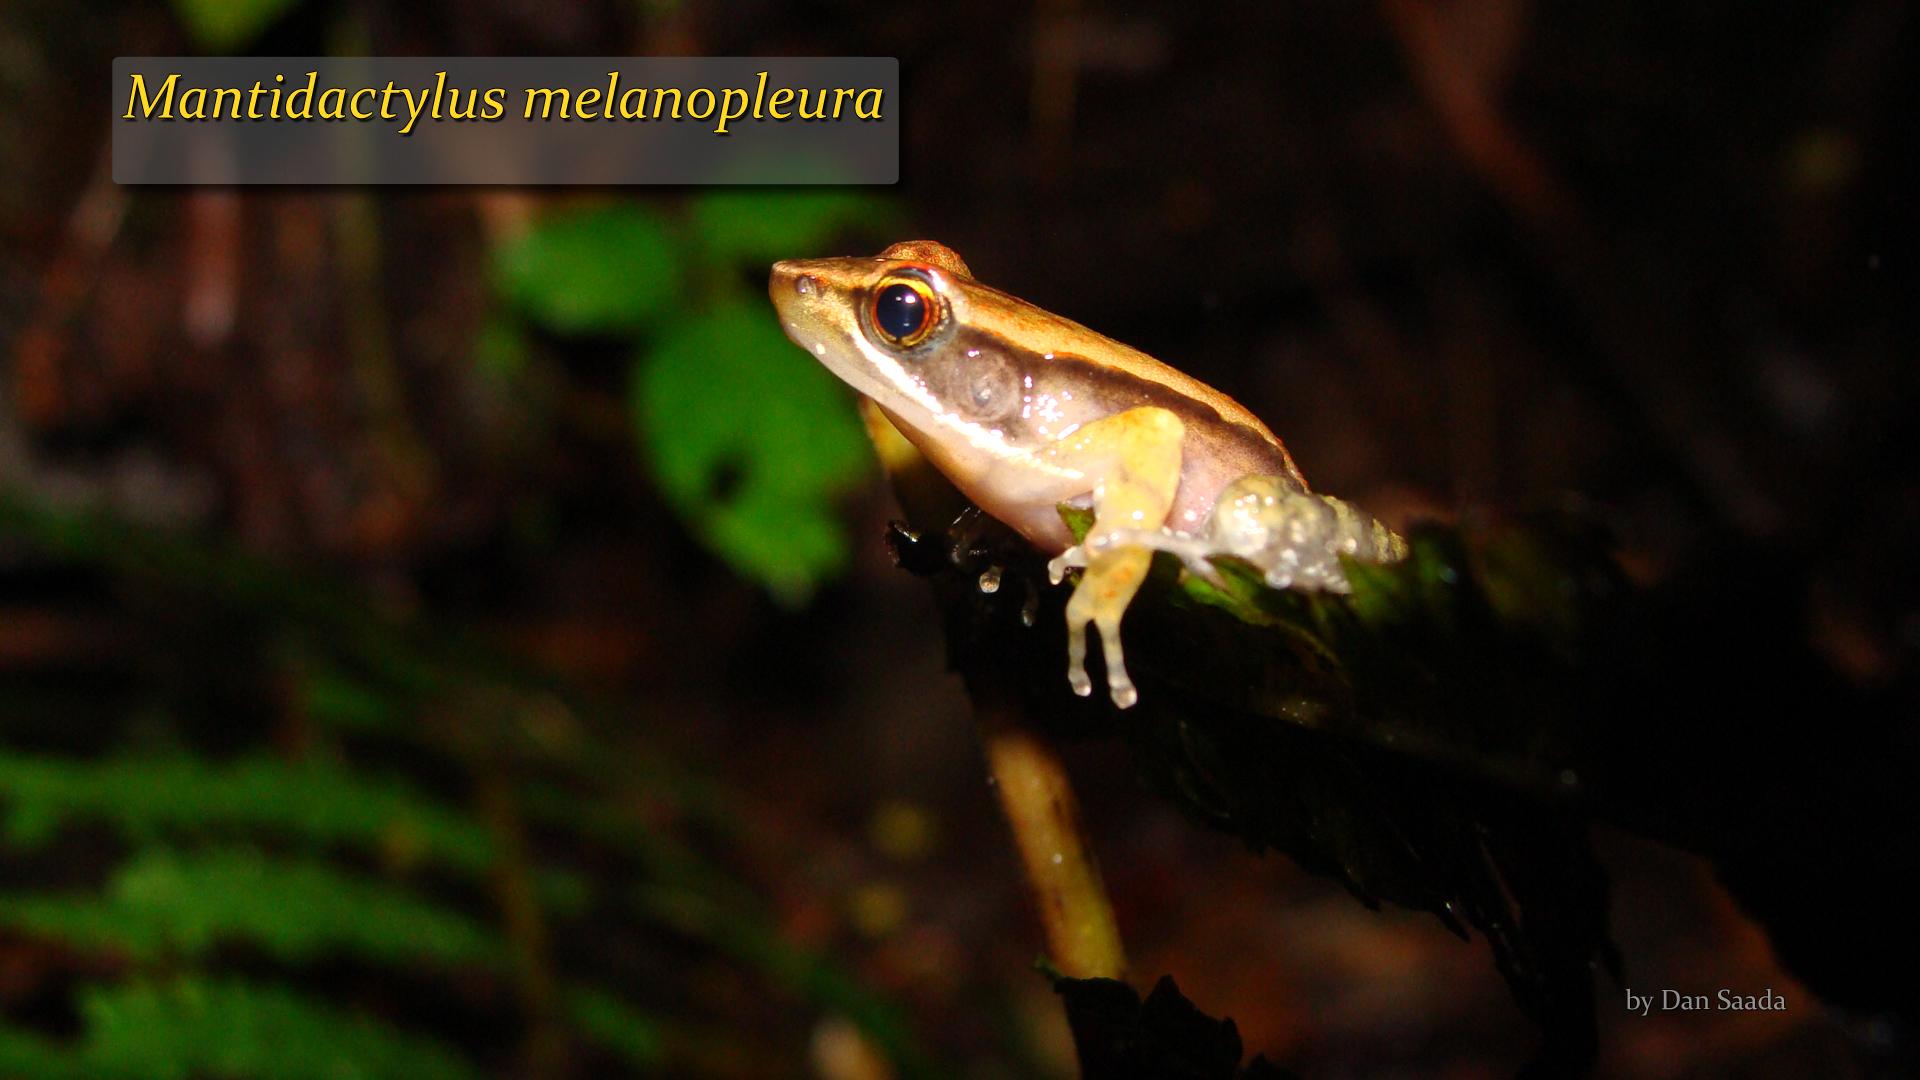 Mantidactylus melanopleura- Dan Saada.jpg